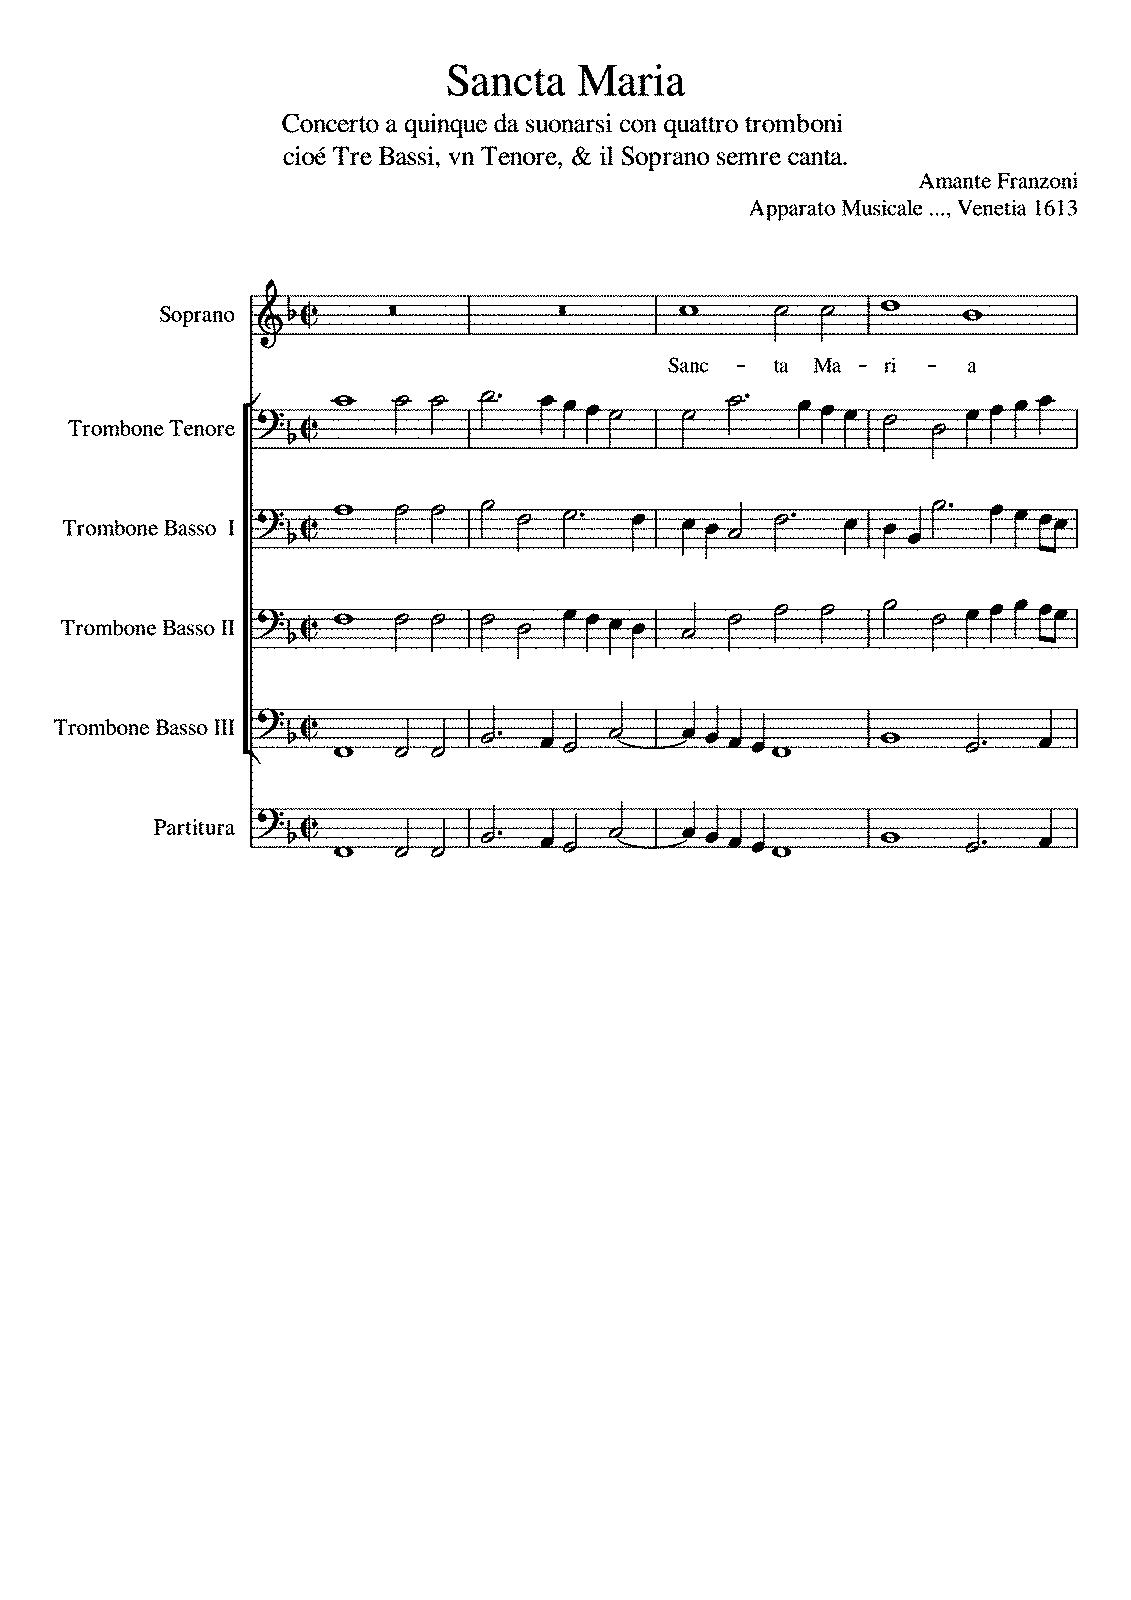 Sancta maria franzoni amante imslppetrucci music library javascript hexwebz Gallery